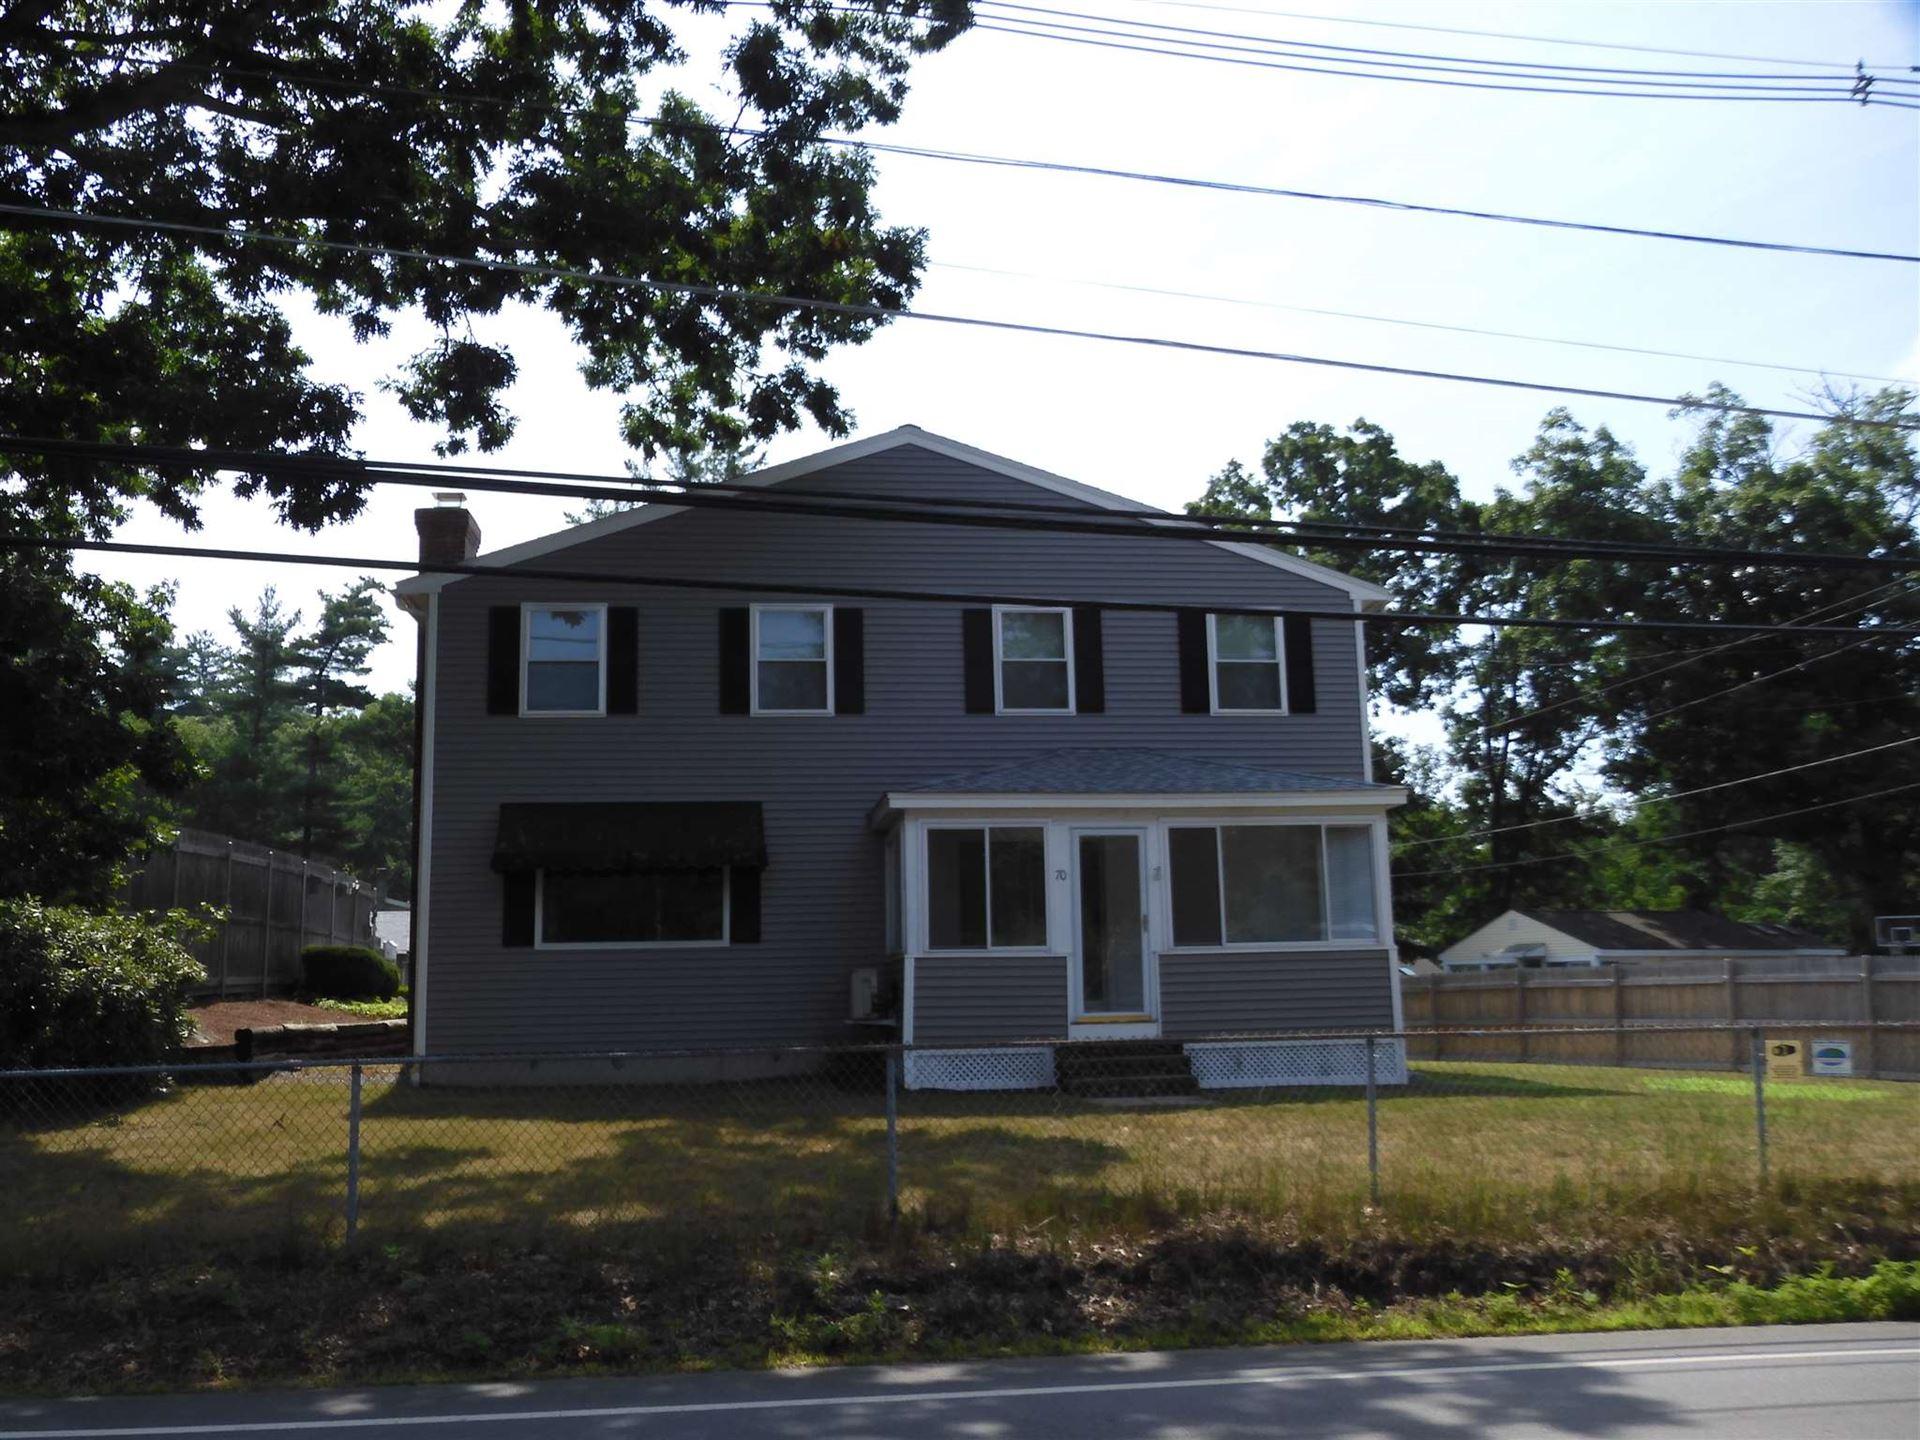 70 Shadow Lake Road, Salem, NH 03079 - #: 4815971